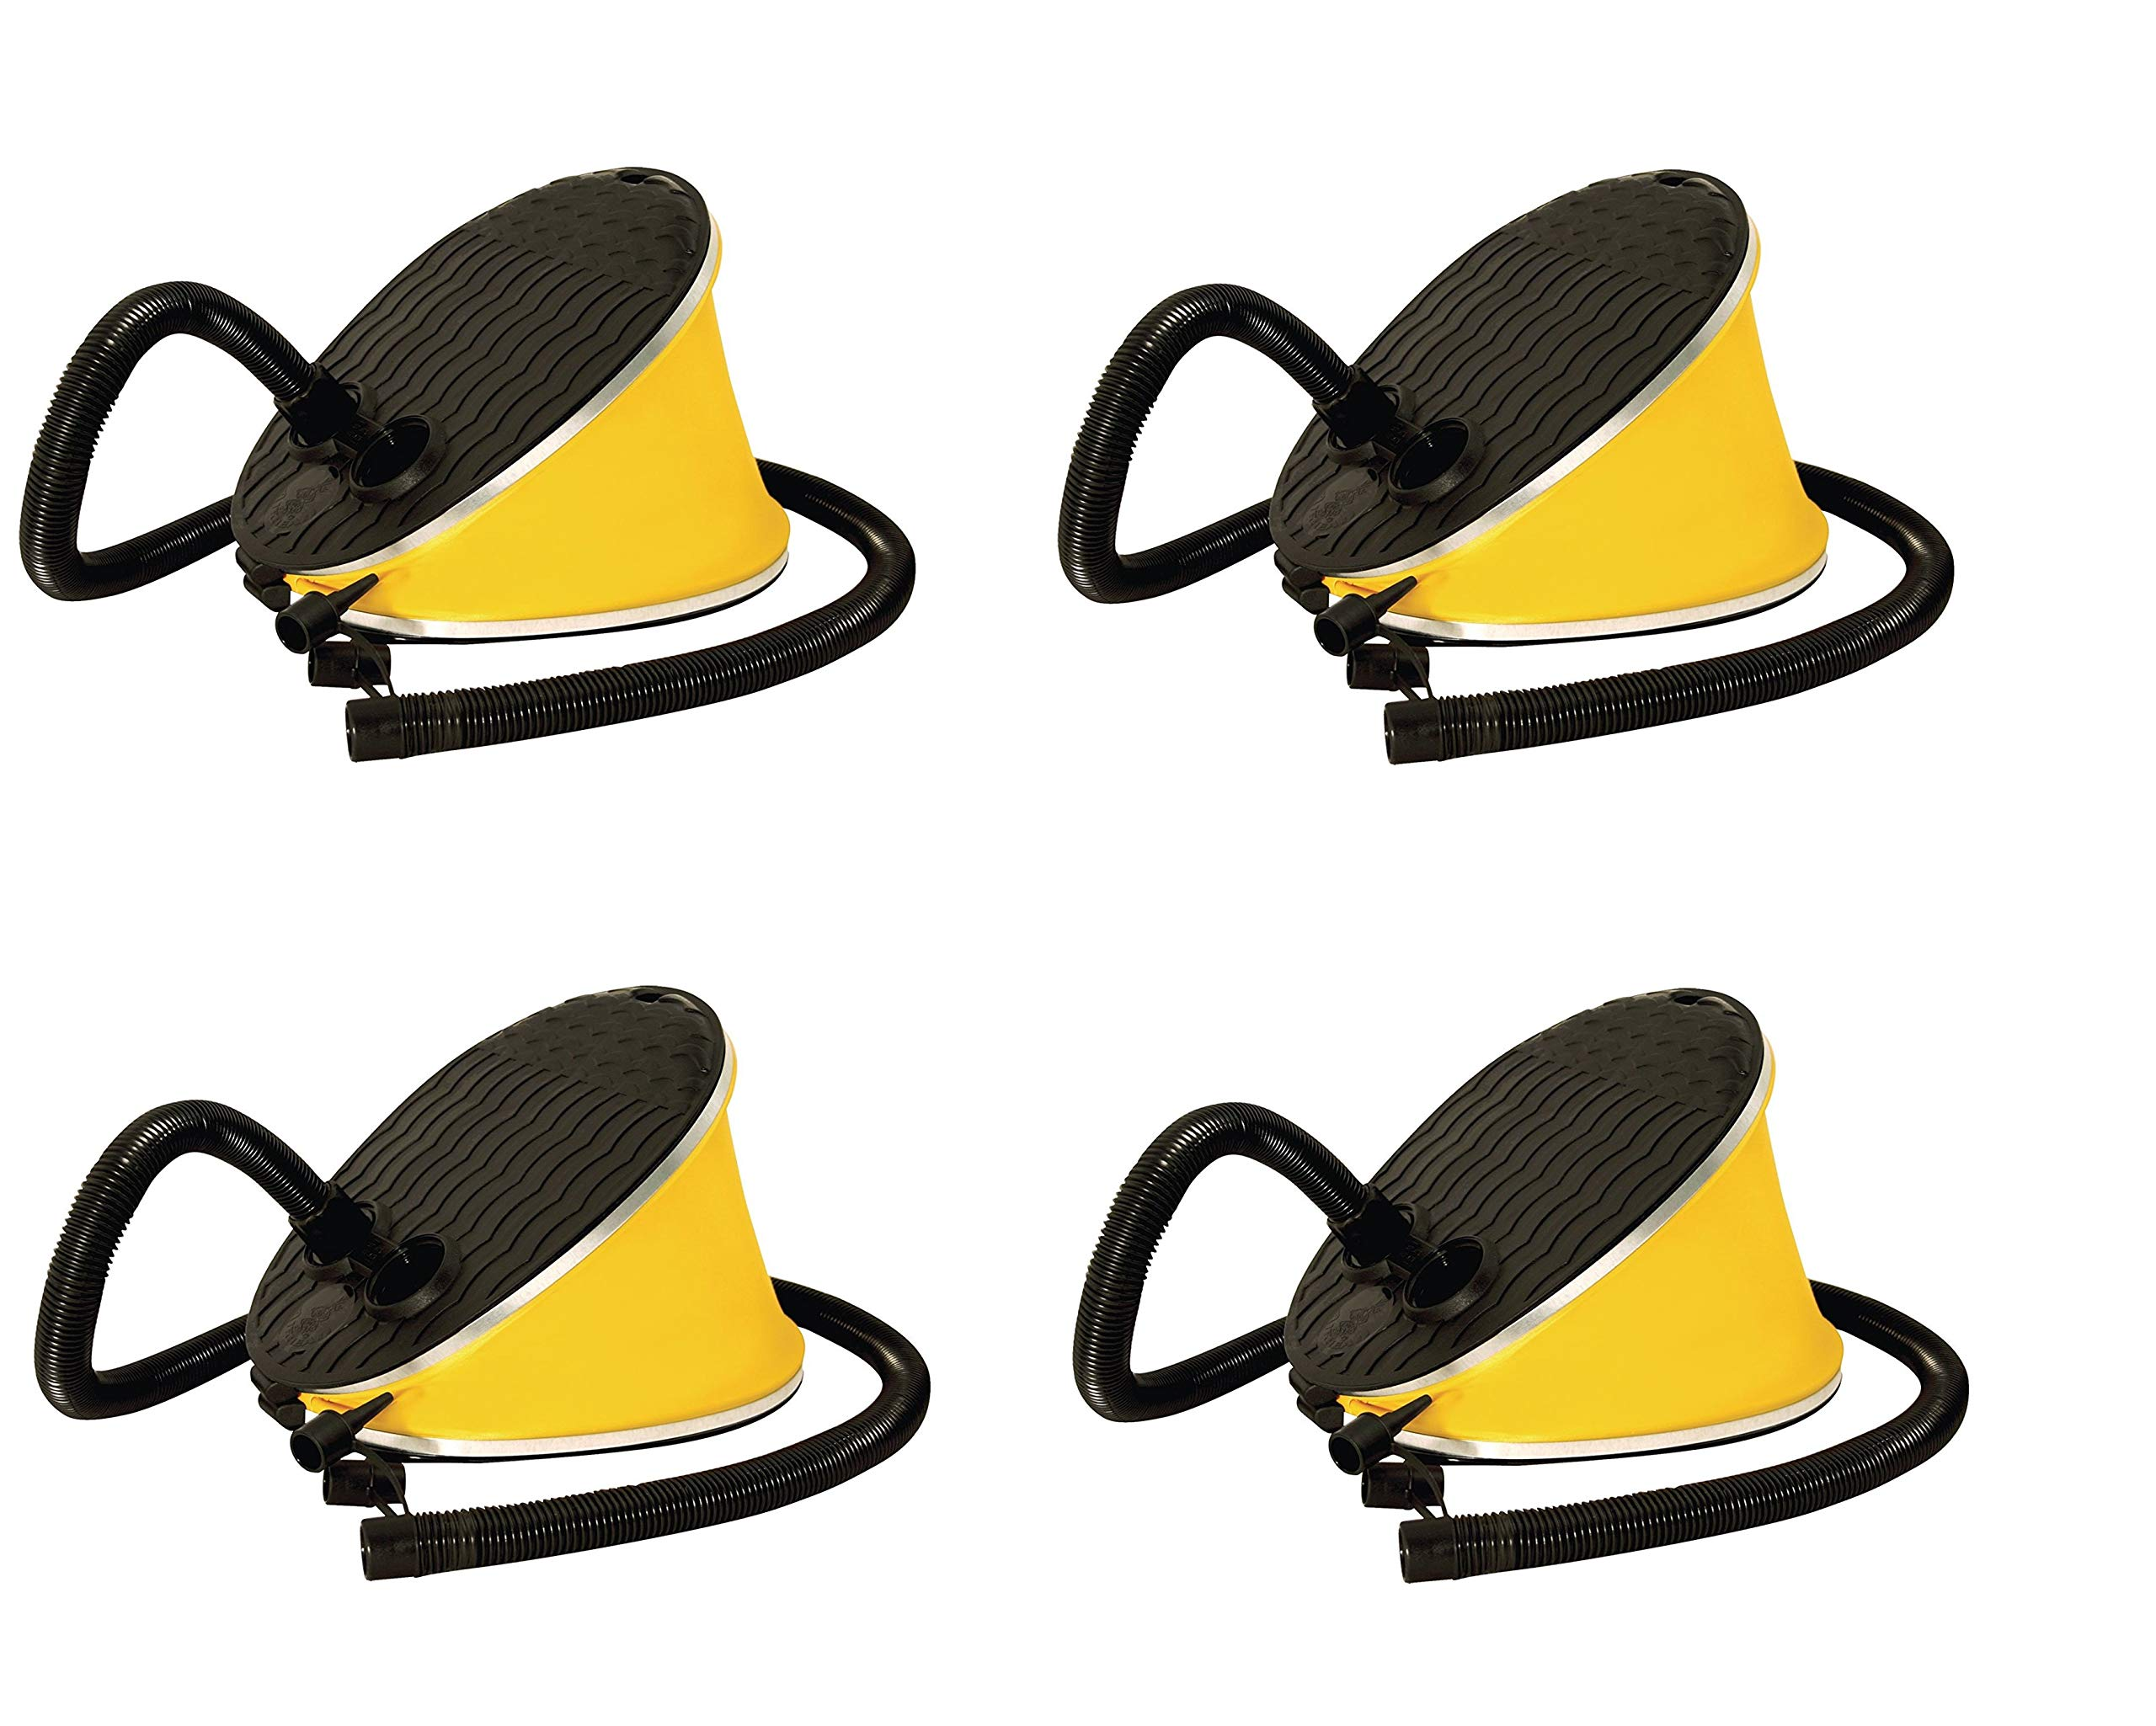 Airhead Bellow Foot Pump (Pack of 4)